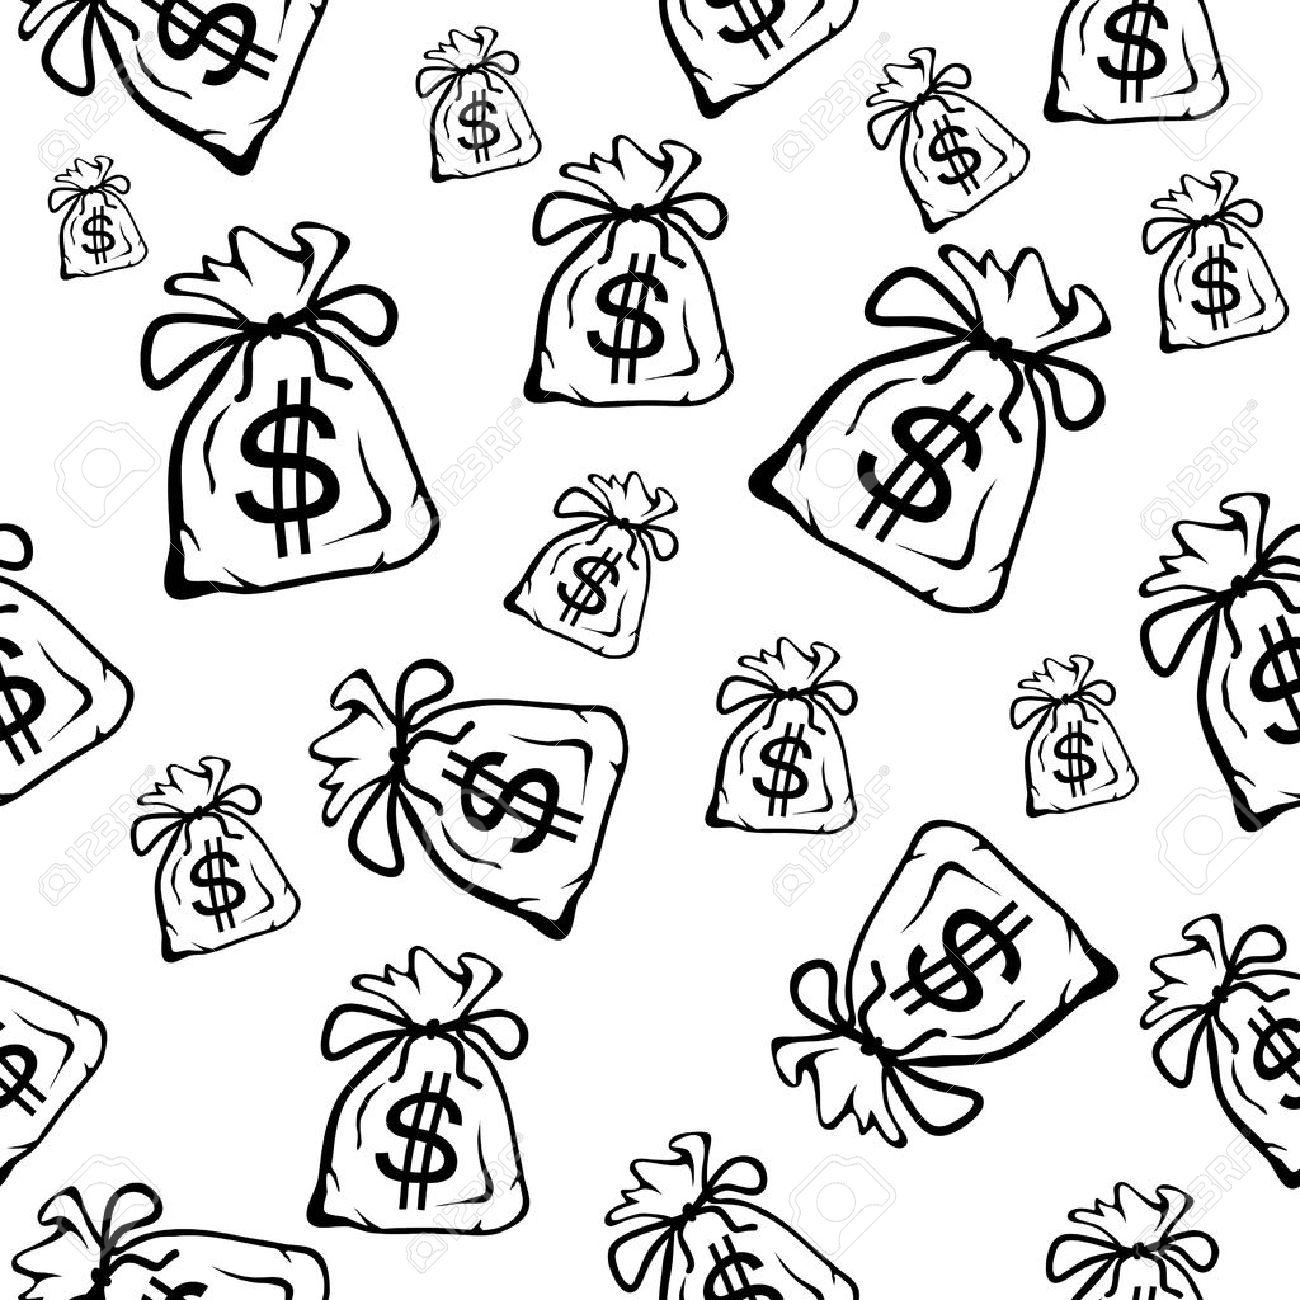 Money Bag Black And White Money Bag Black And White